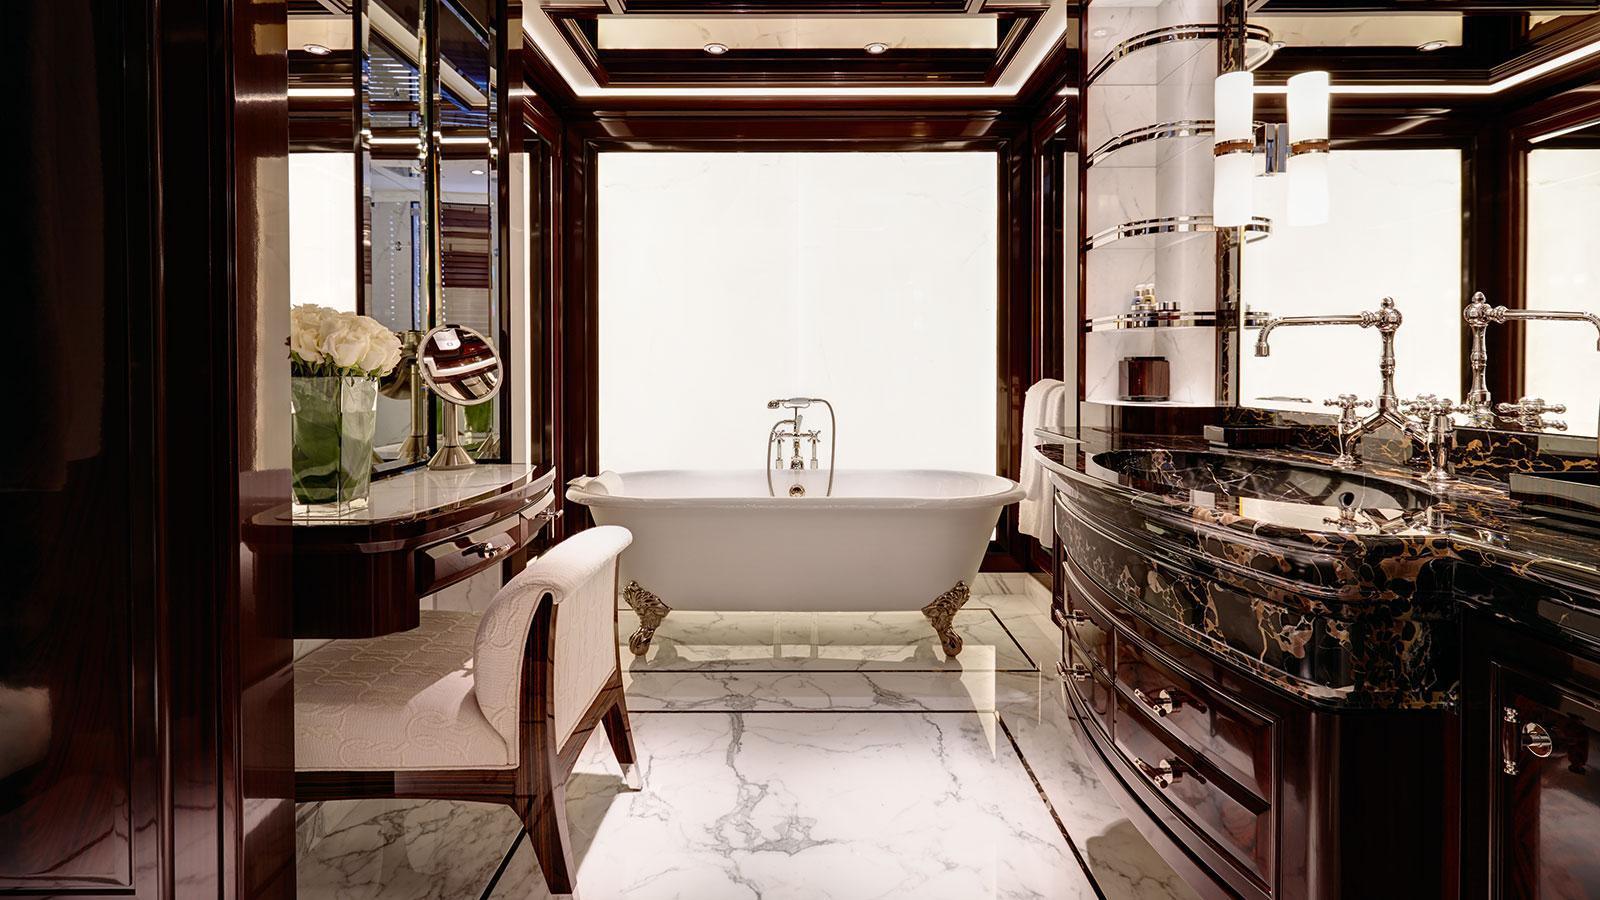 rock-it-motor-yacht-feadship-2014-60m-masters-hers-bathroom